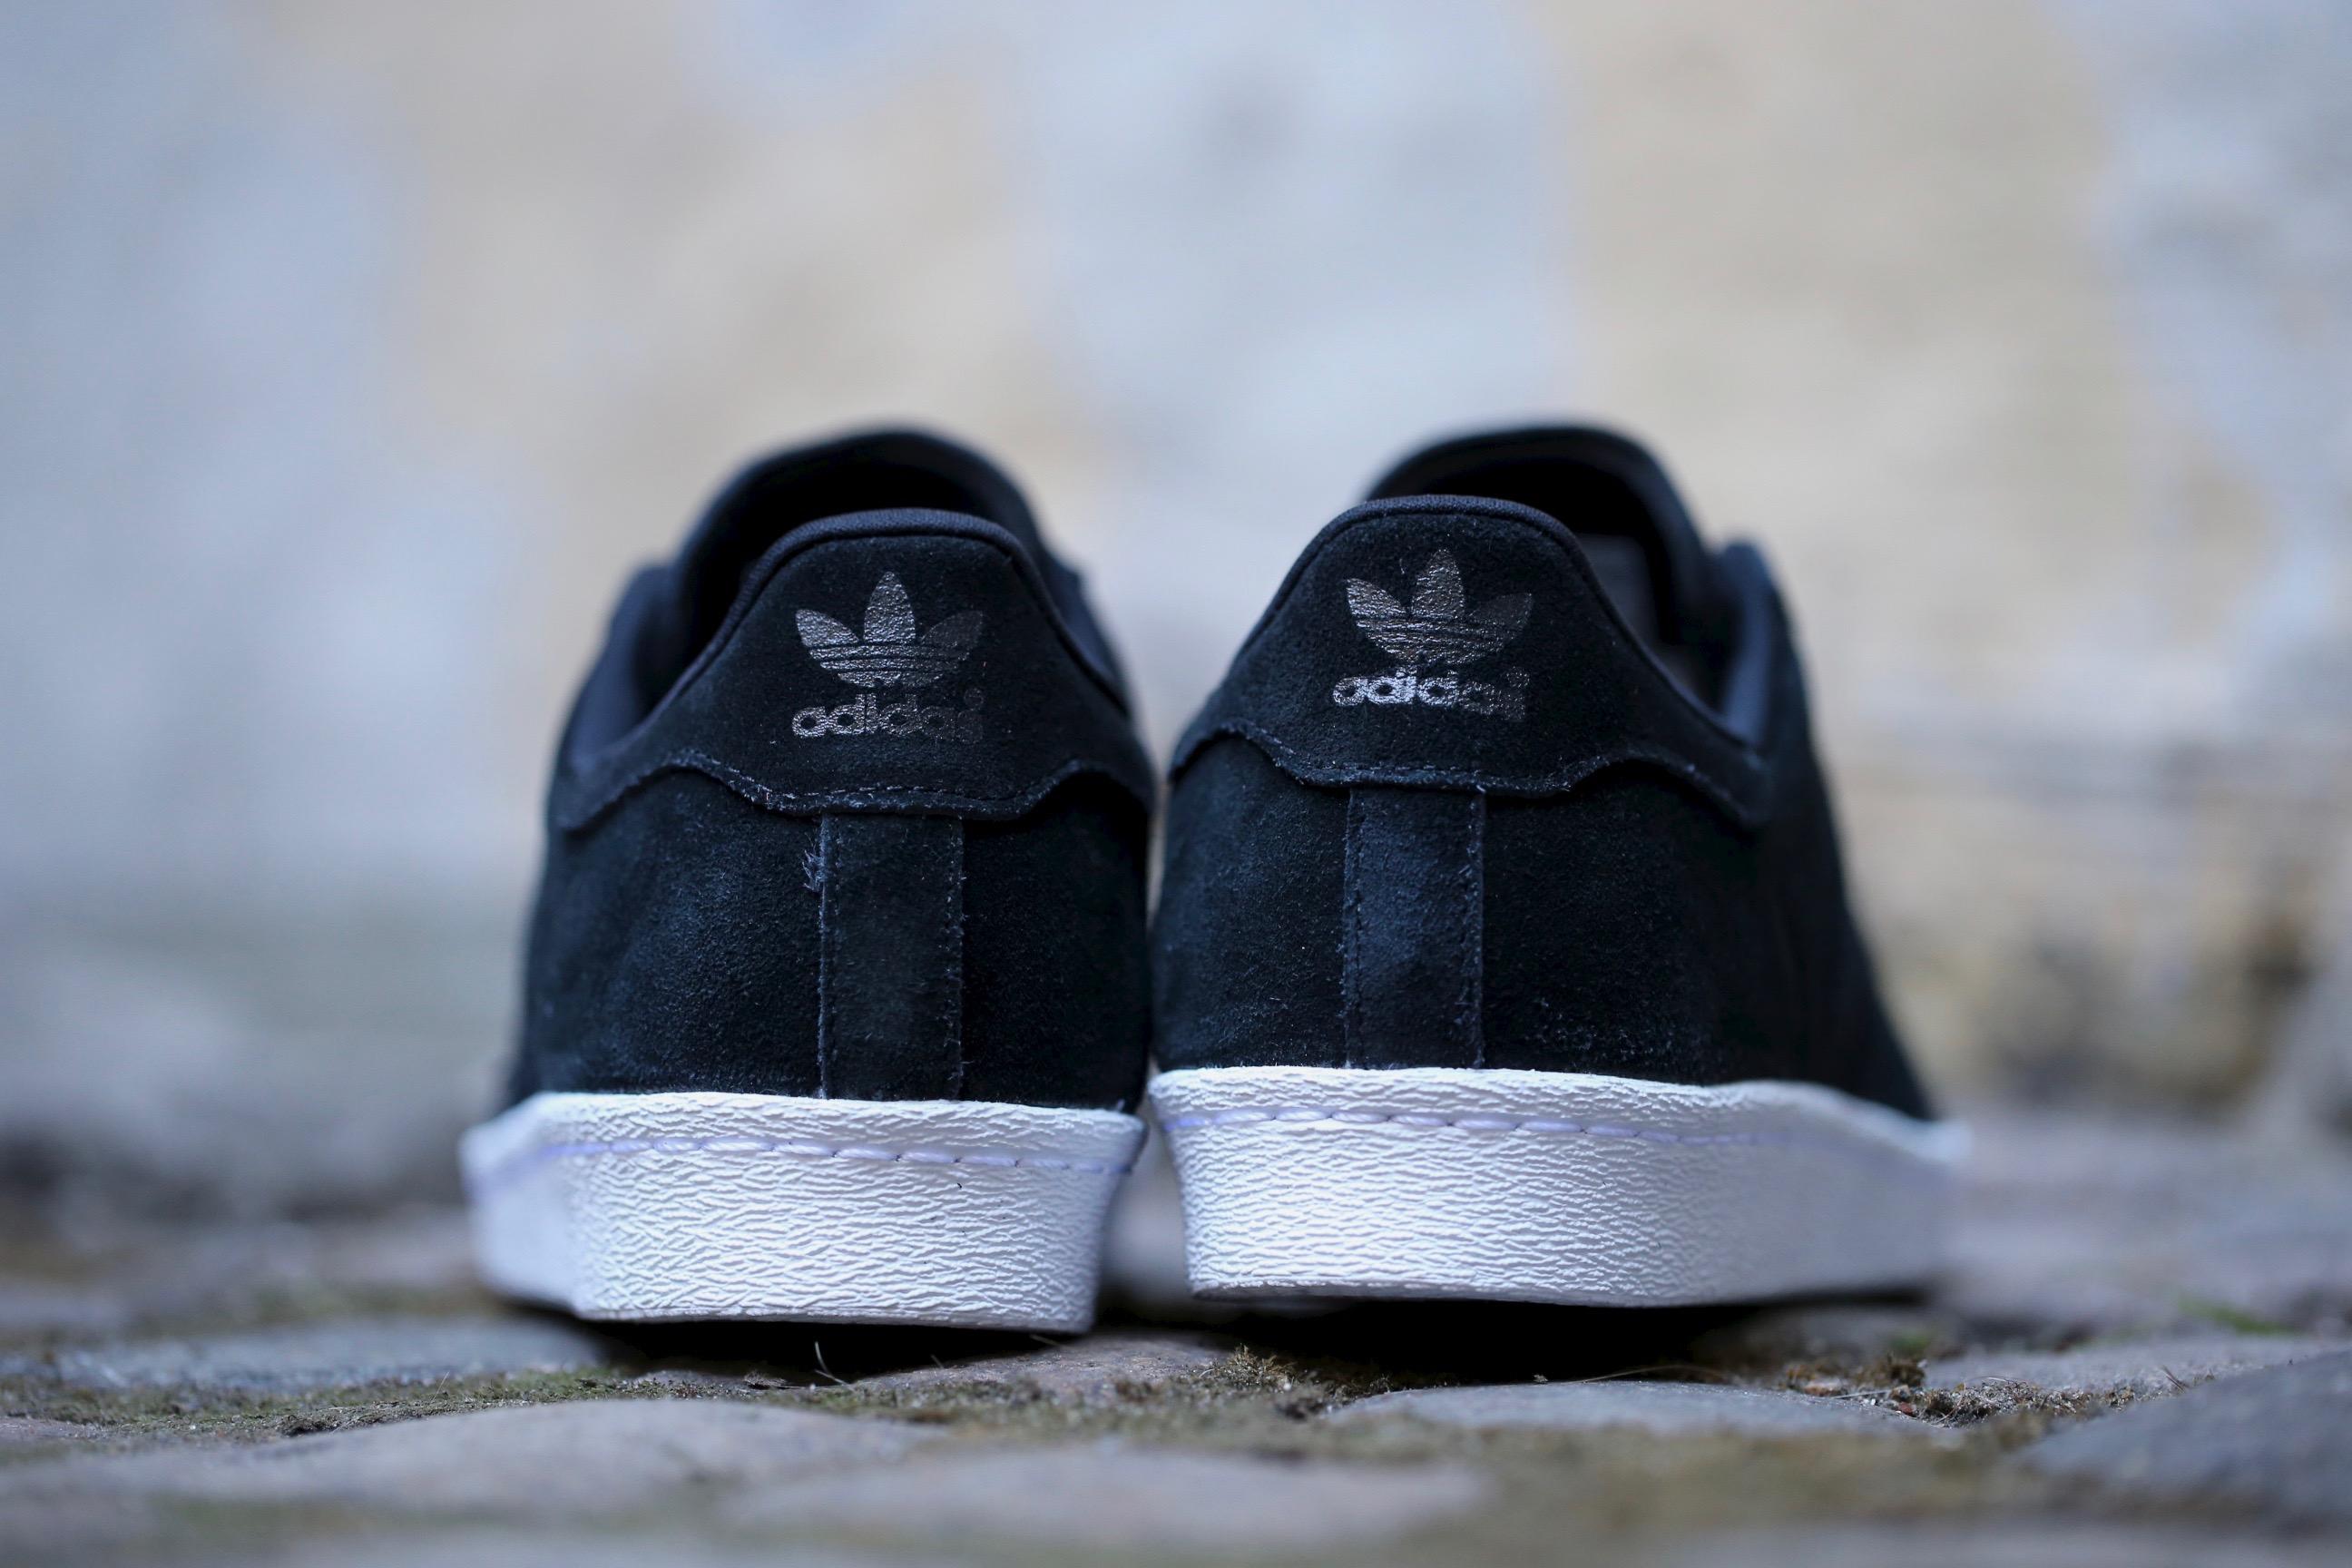 80 Adidas Superstar Dedo Del Pie Negro De Metal 3ZAD8WfN